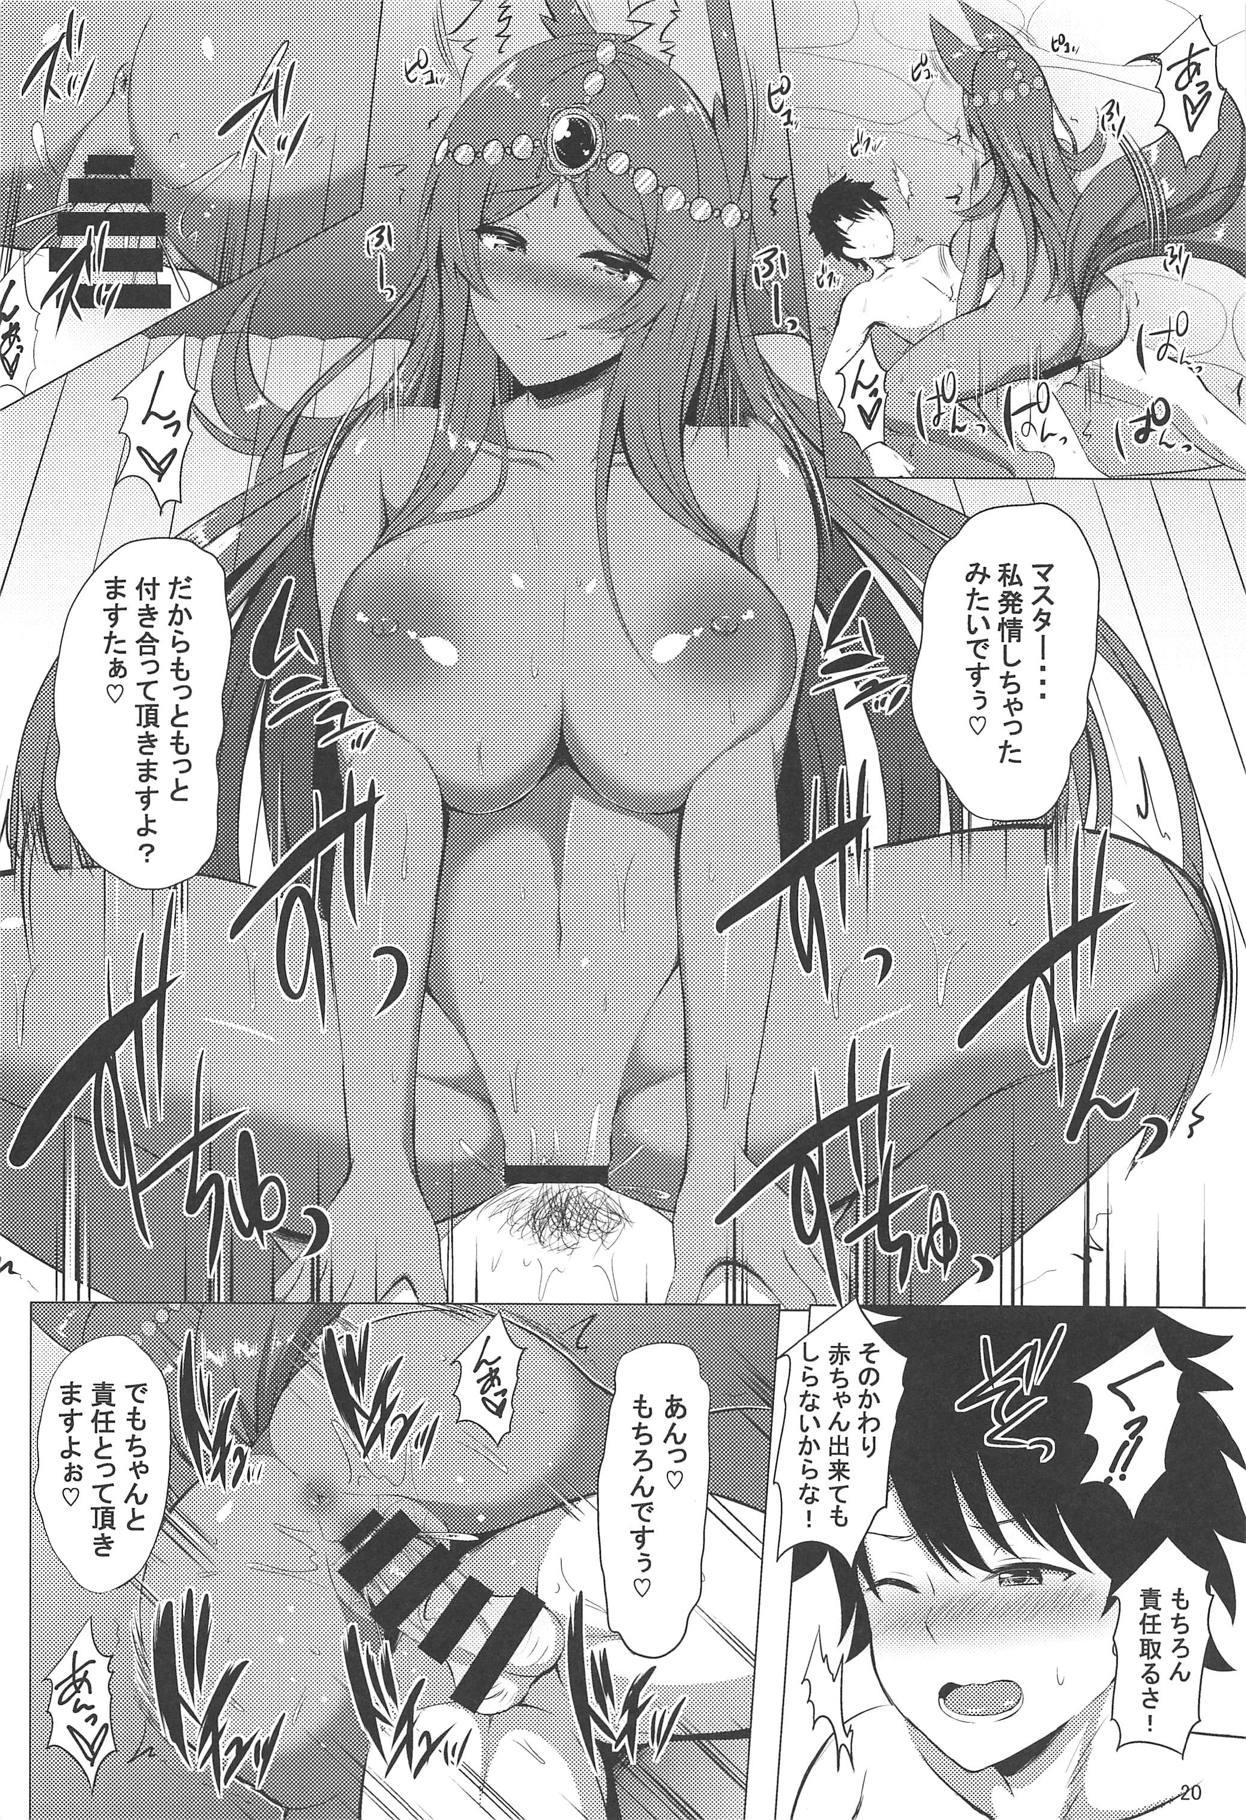 MidCas-san to Kashikiri Rotenburo 18